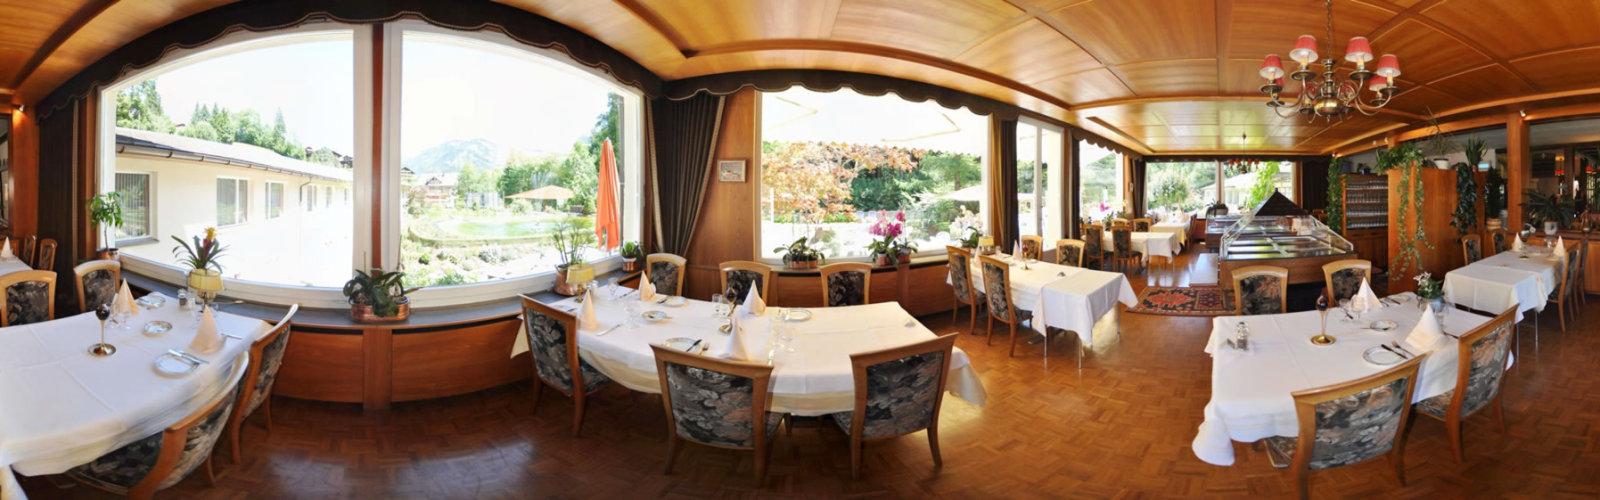 Gastronomie vista resort hotel - Restaurant terrasse jardin grenoble mulhouse ...